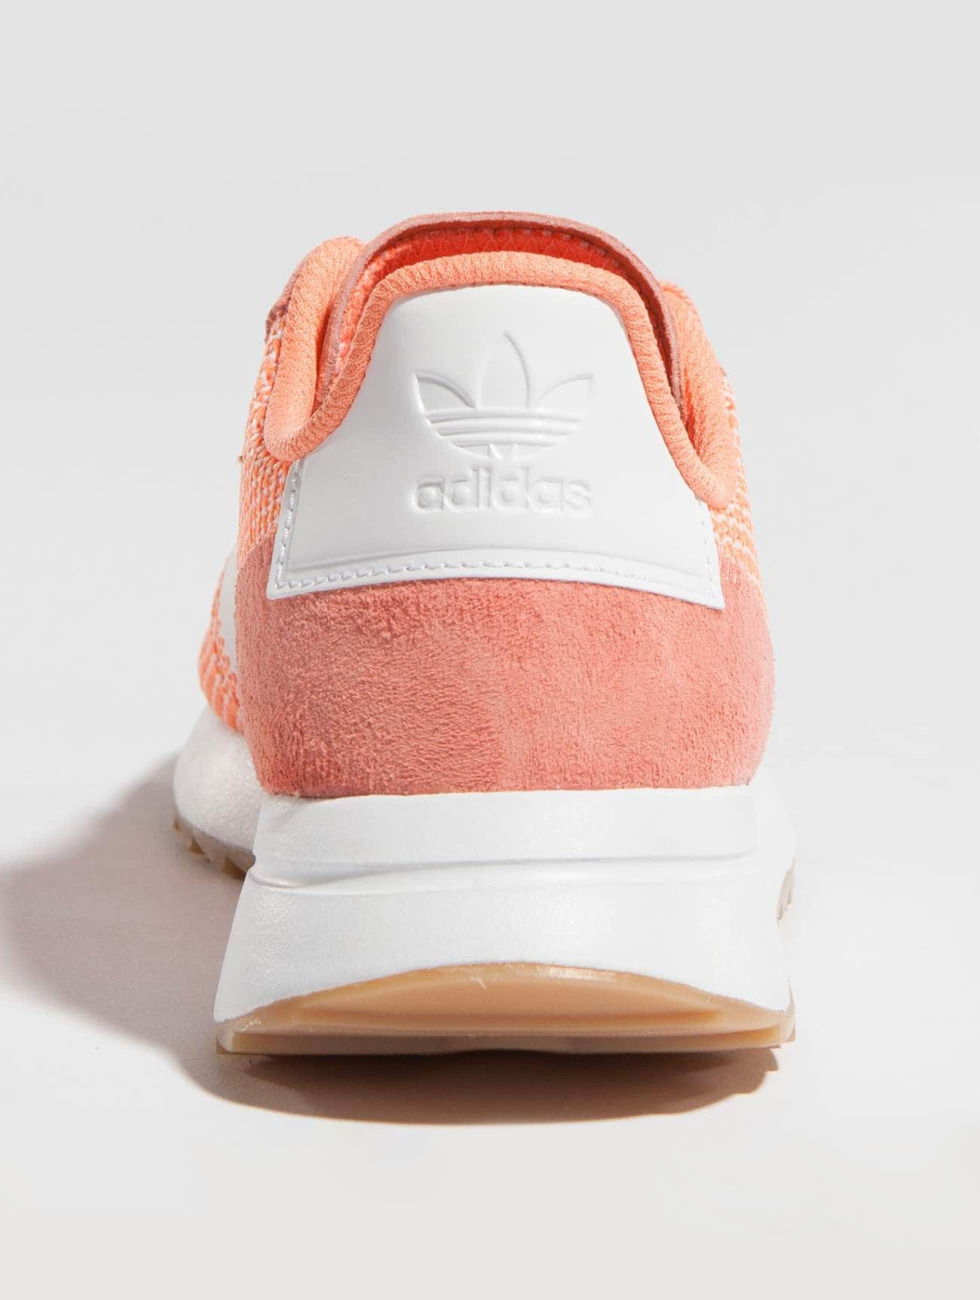 adidas originals Tennarit originals Flashback Runner oranssi